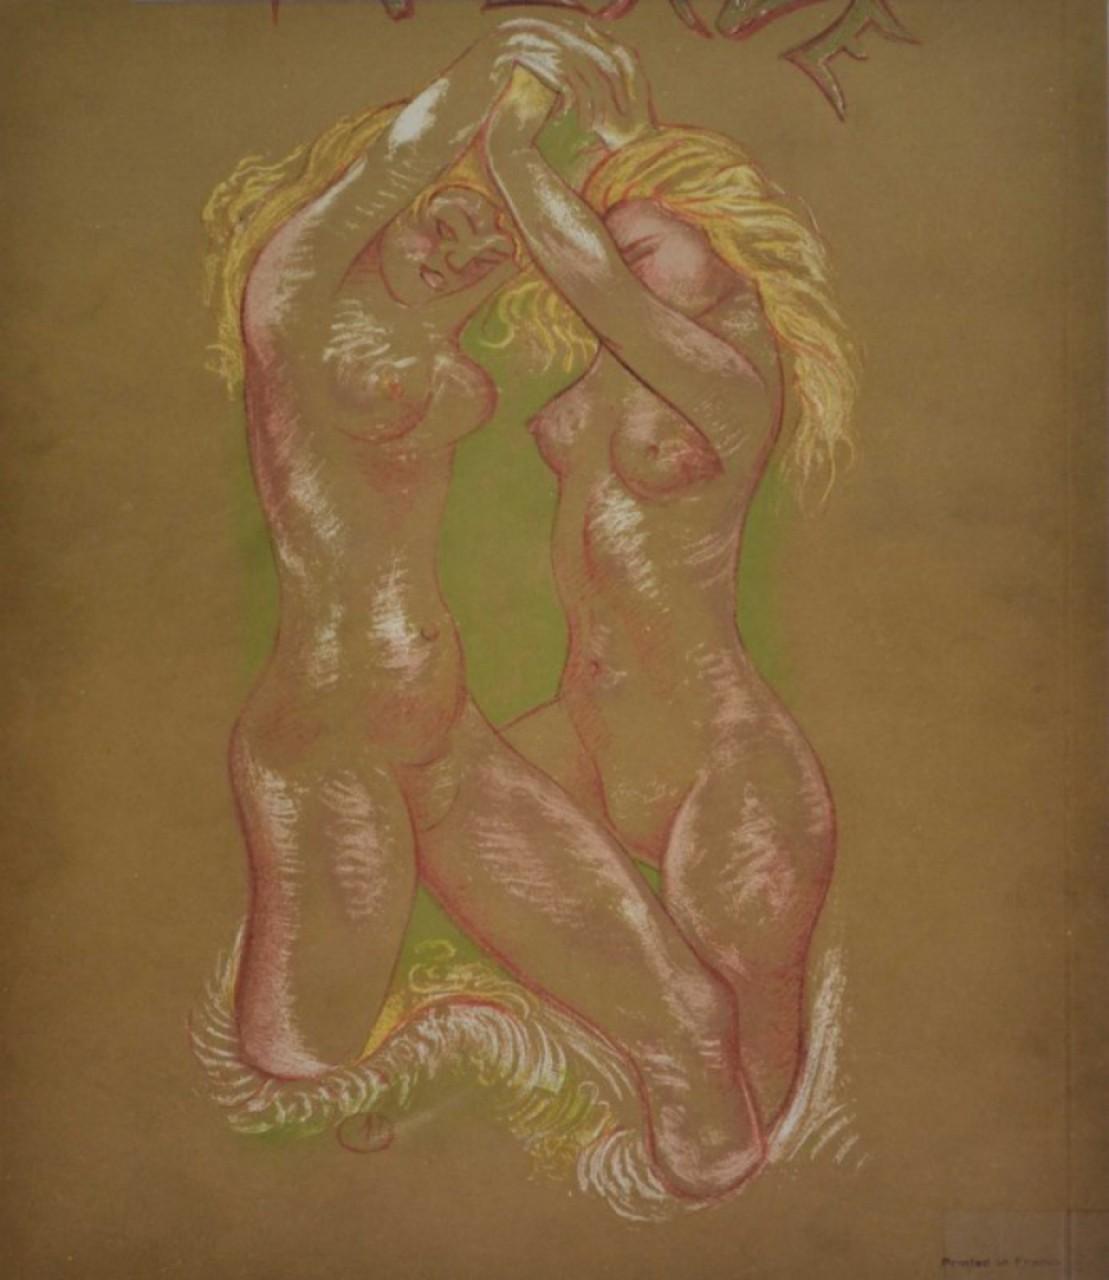 MAILLOL Aristide combat de nus blonds